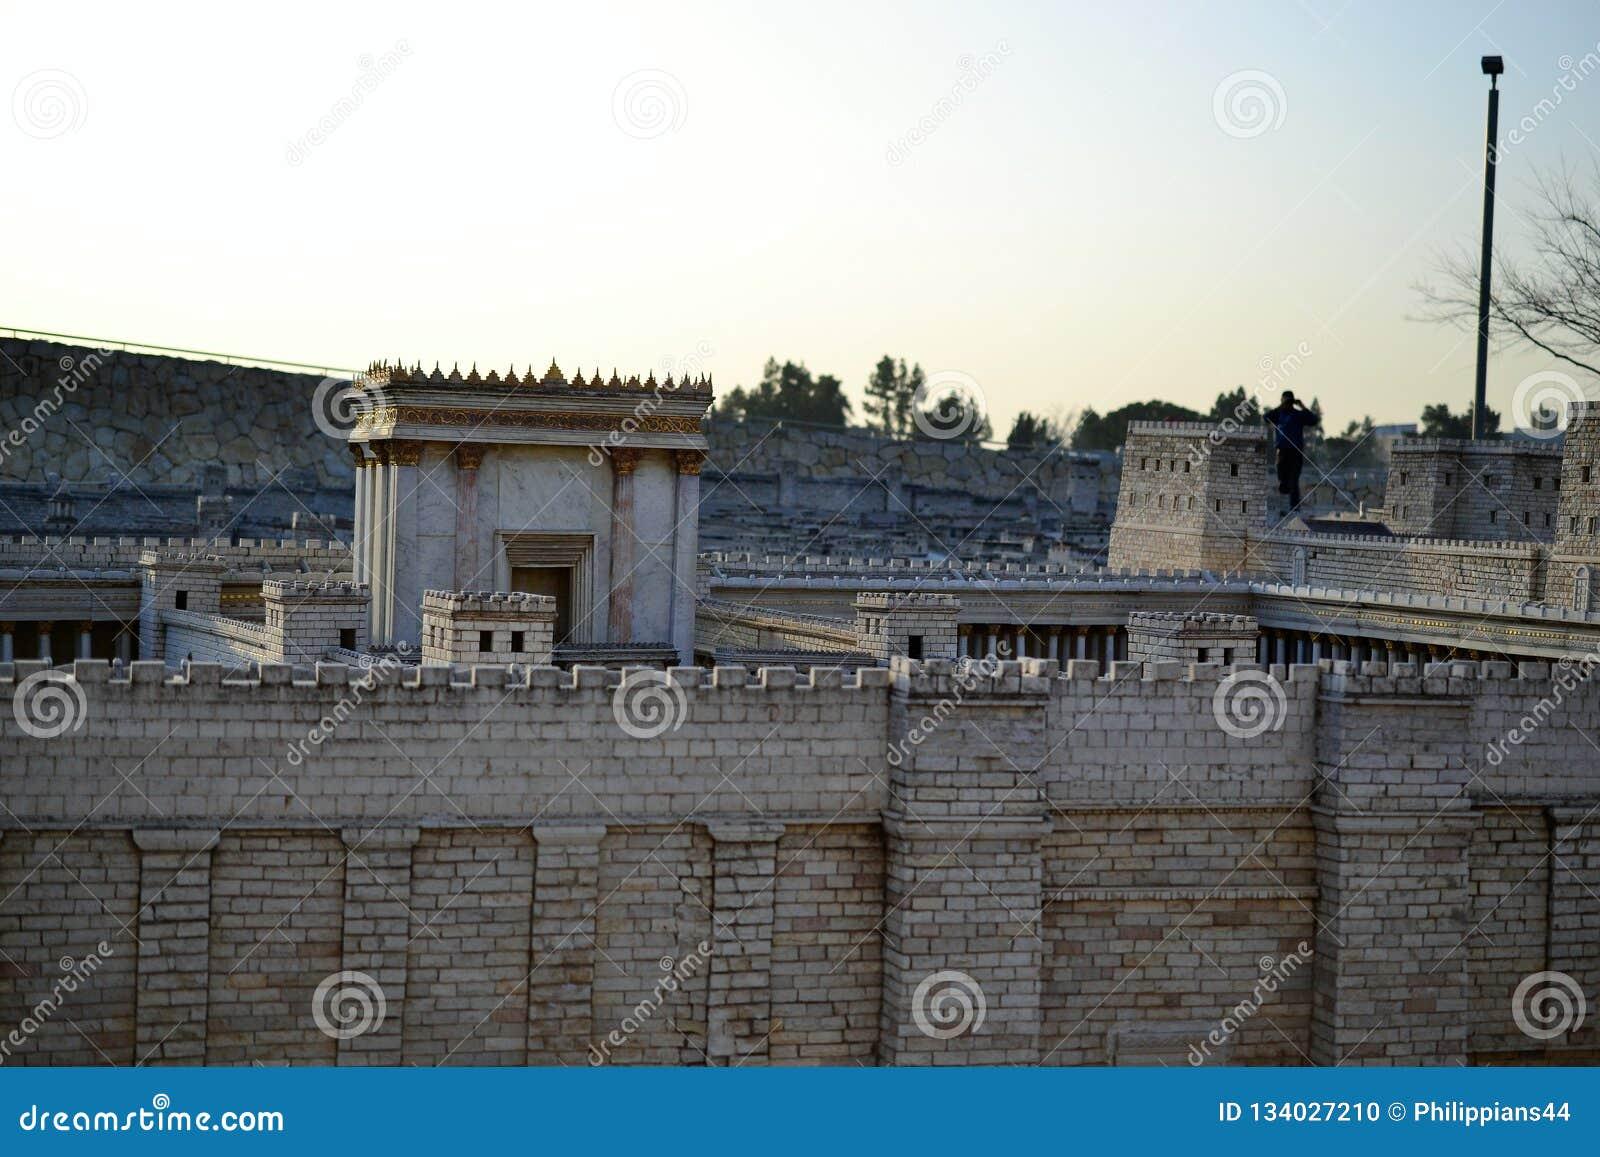 Second Temple. Model of the ancient Jerusalem. Israel Museum in Jerusalem